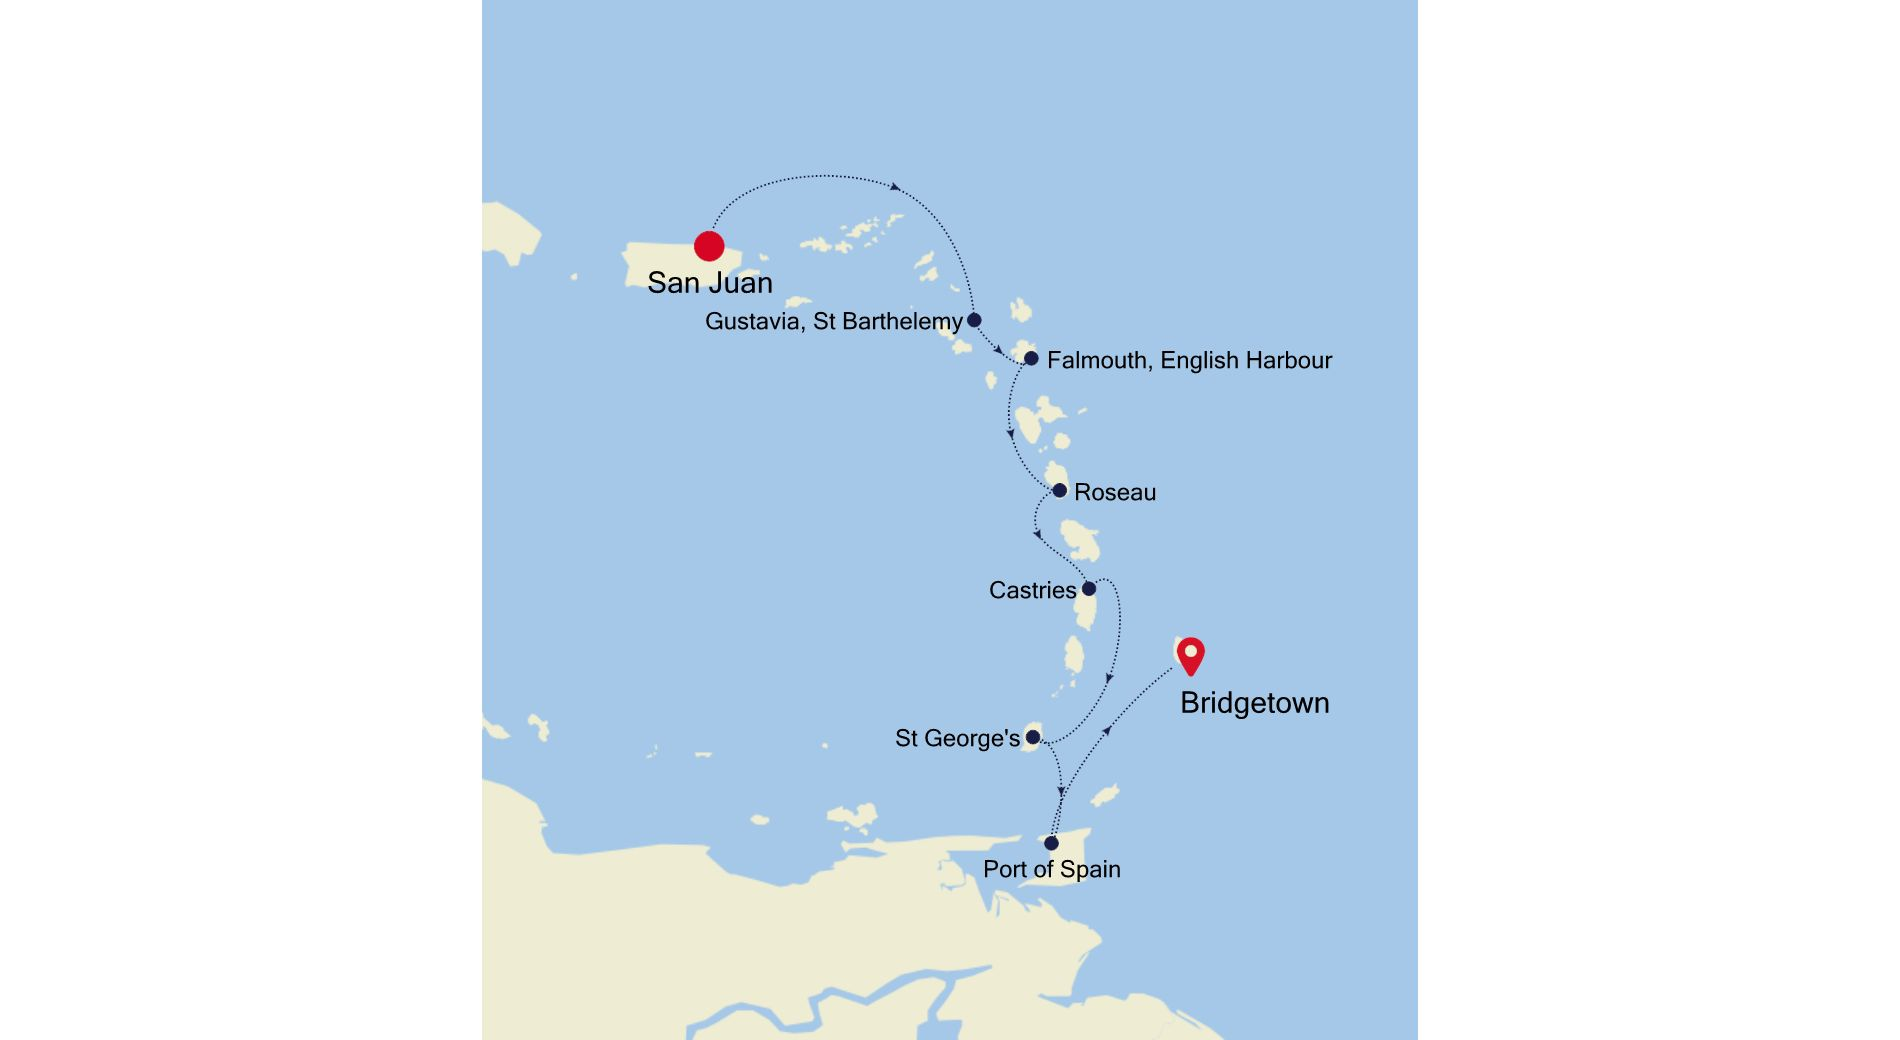 2931A - San Juan to Bridgetown